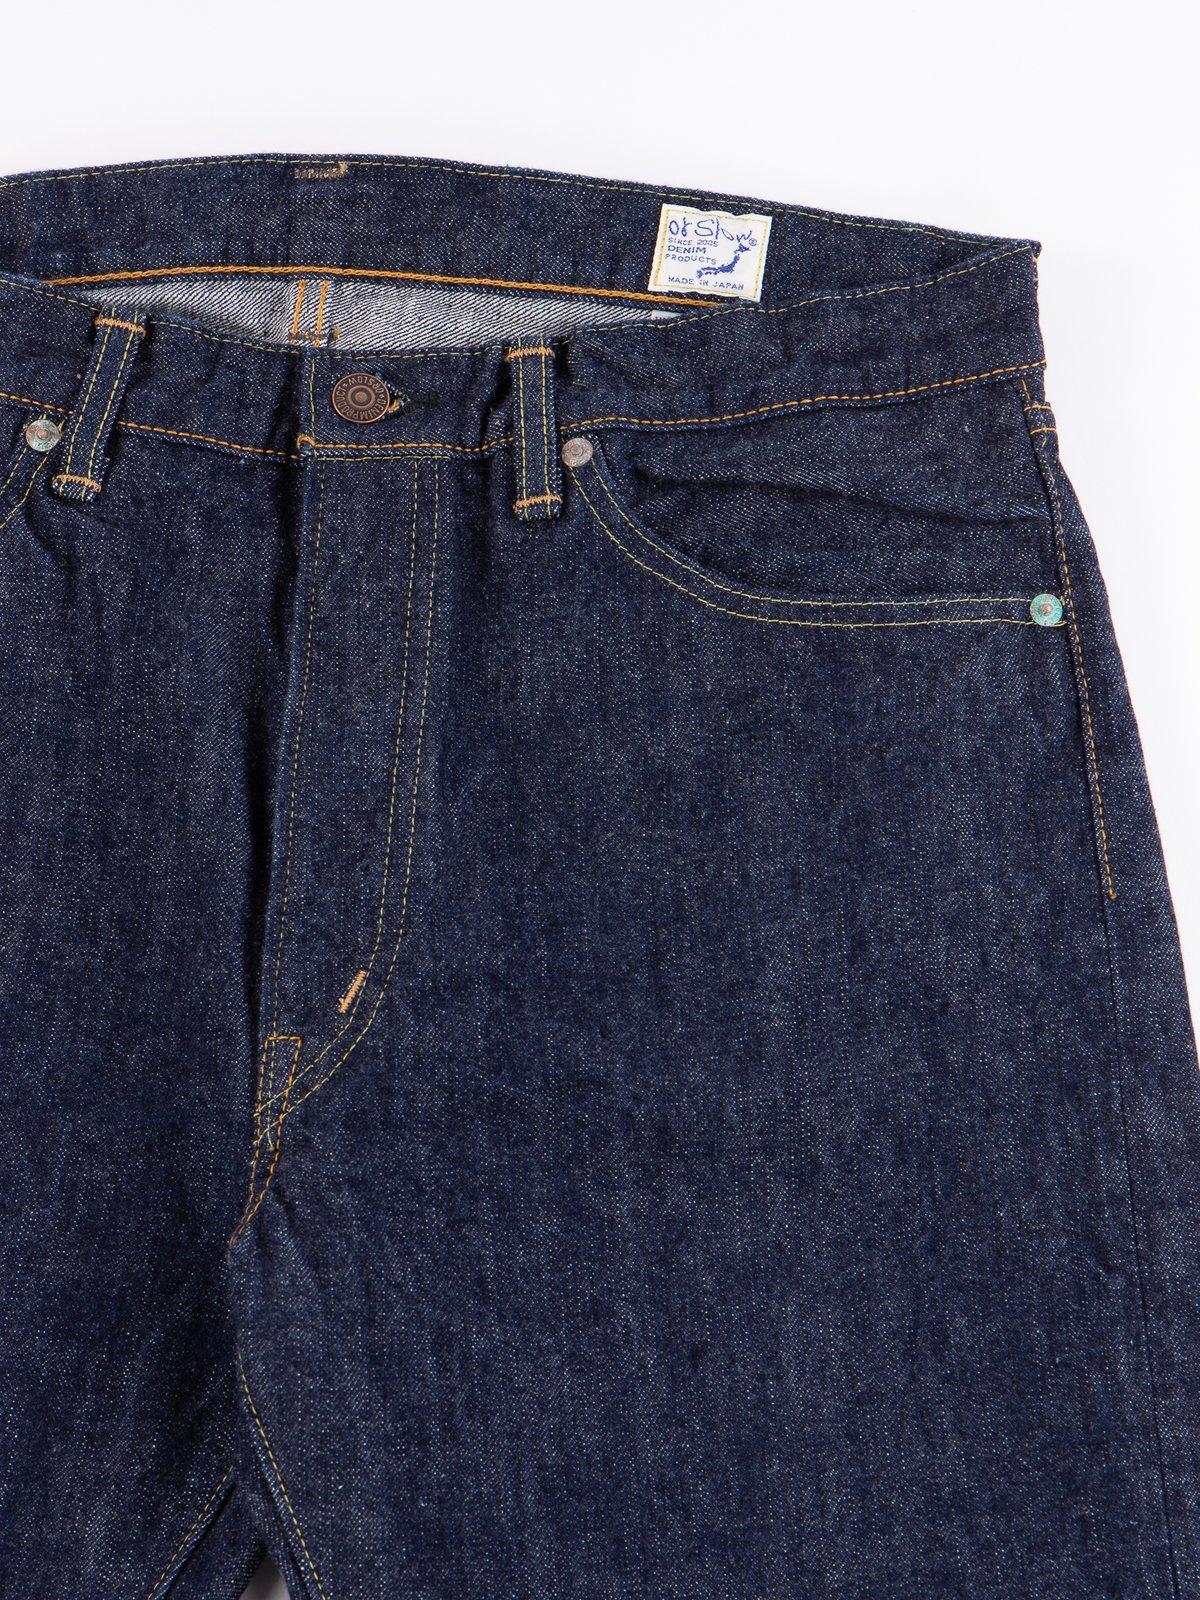 Indigo One Wash 107 Slim Fit Jean - Image 4